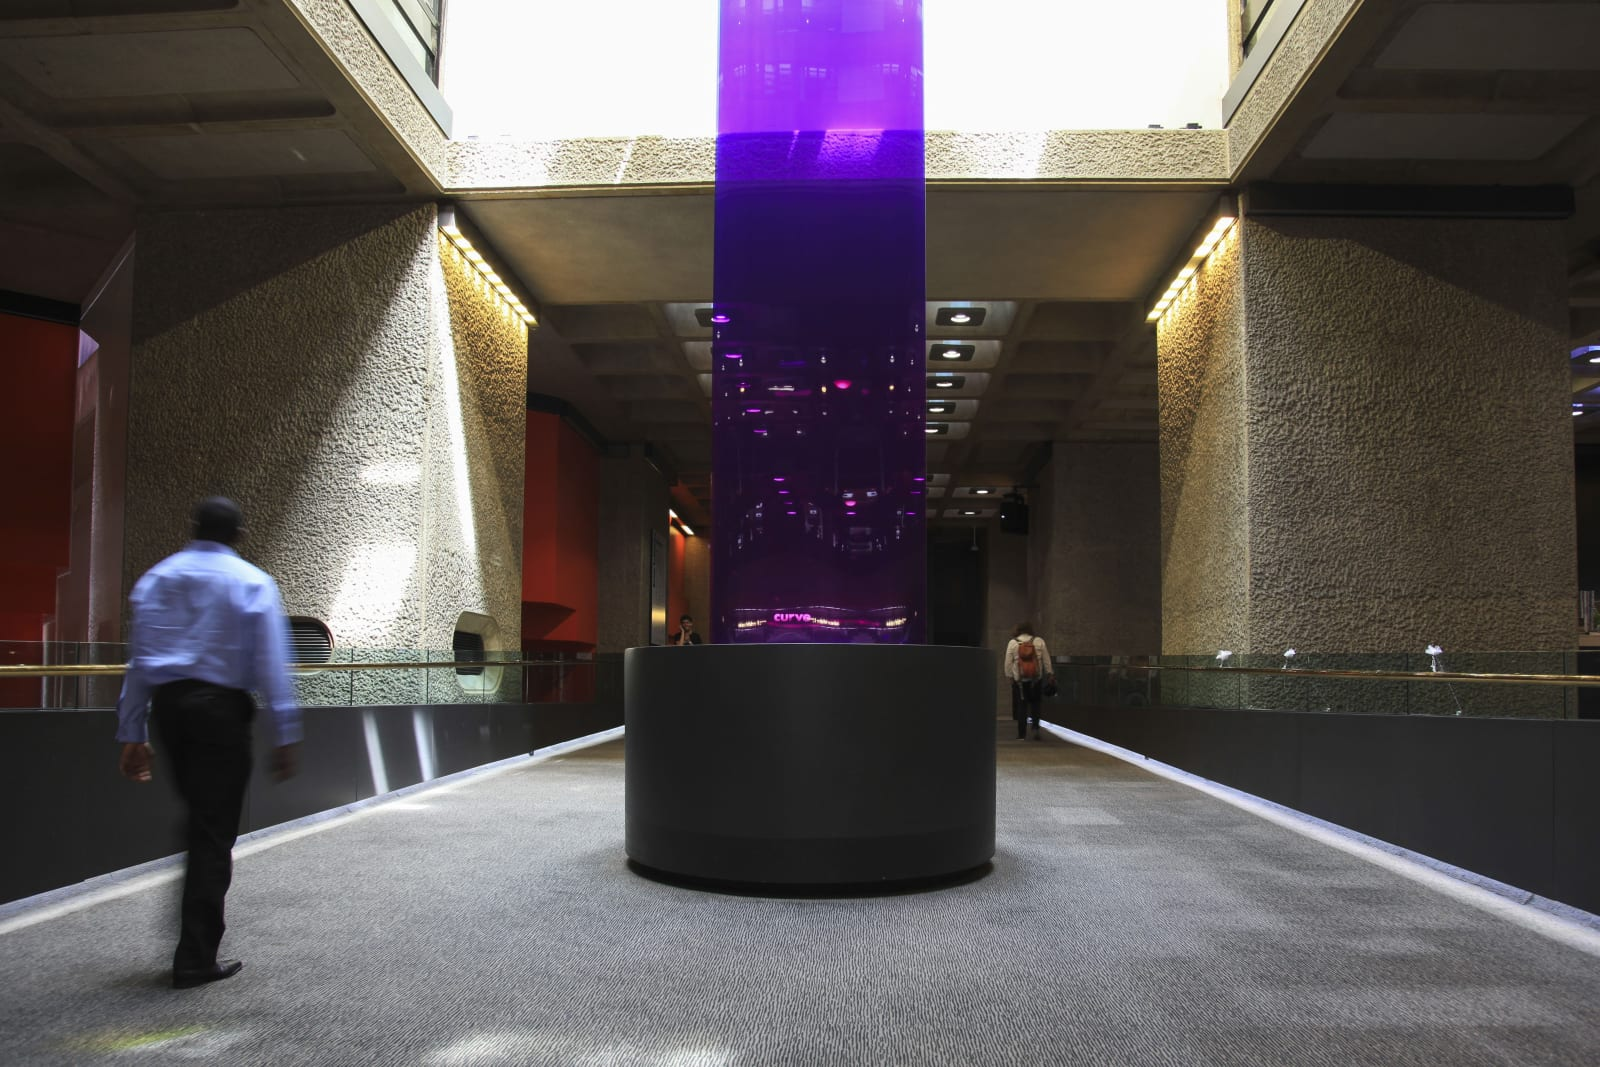 Installation View Borrowed Light (2018), Barbican Center, London (2018-2019)   Photo: Studio Troika